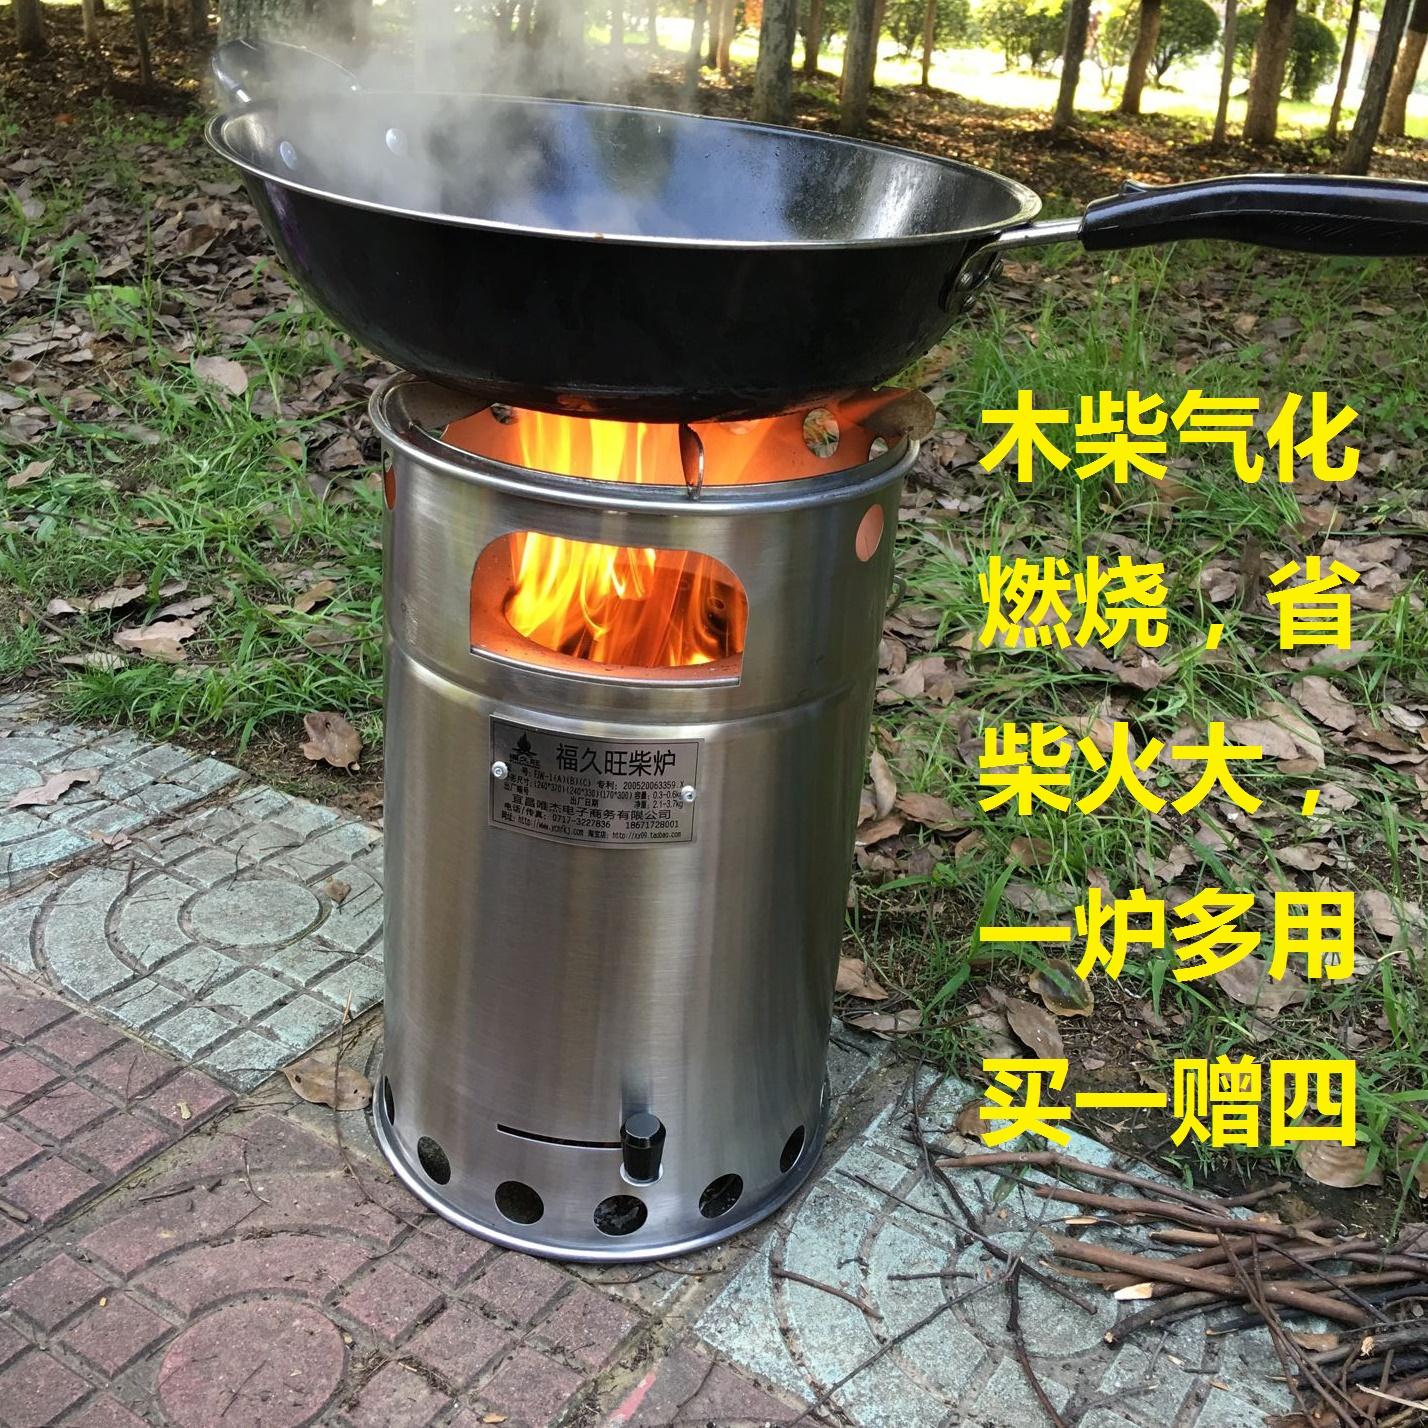 福久旺 дрова в печи открытый переносных лесополоса бытовых плит самостоятельно водить экскурсии барбекю печь газификации печь дрова